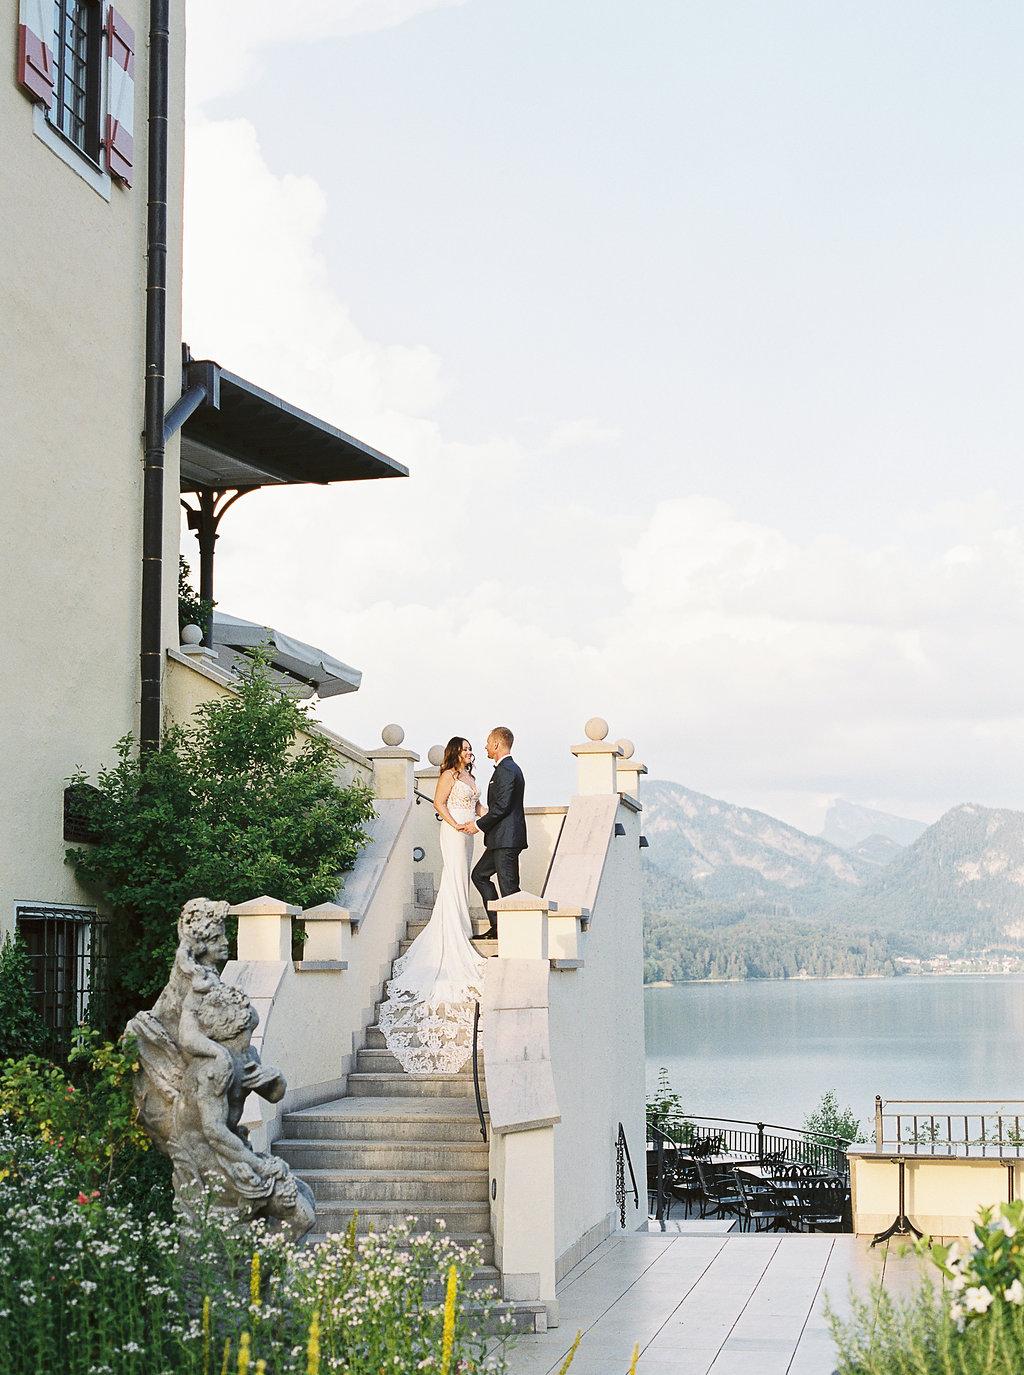 Luxe Navy and Pink Wedding at Schloss Fuschl in Austria by Tanja Kibogo11.JPG